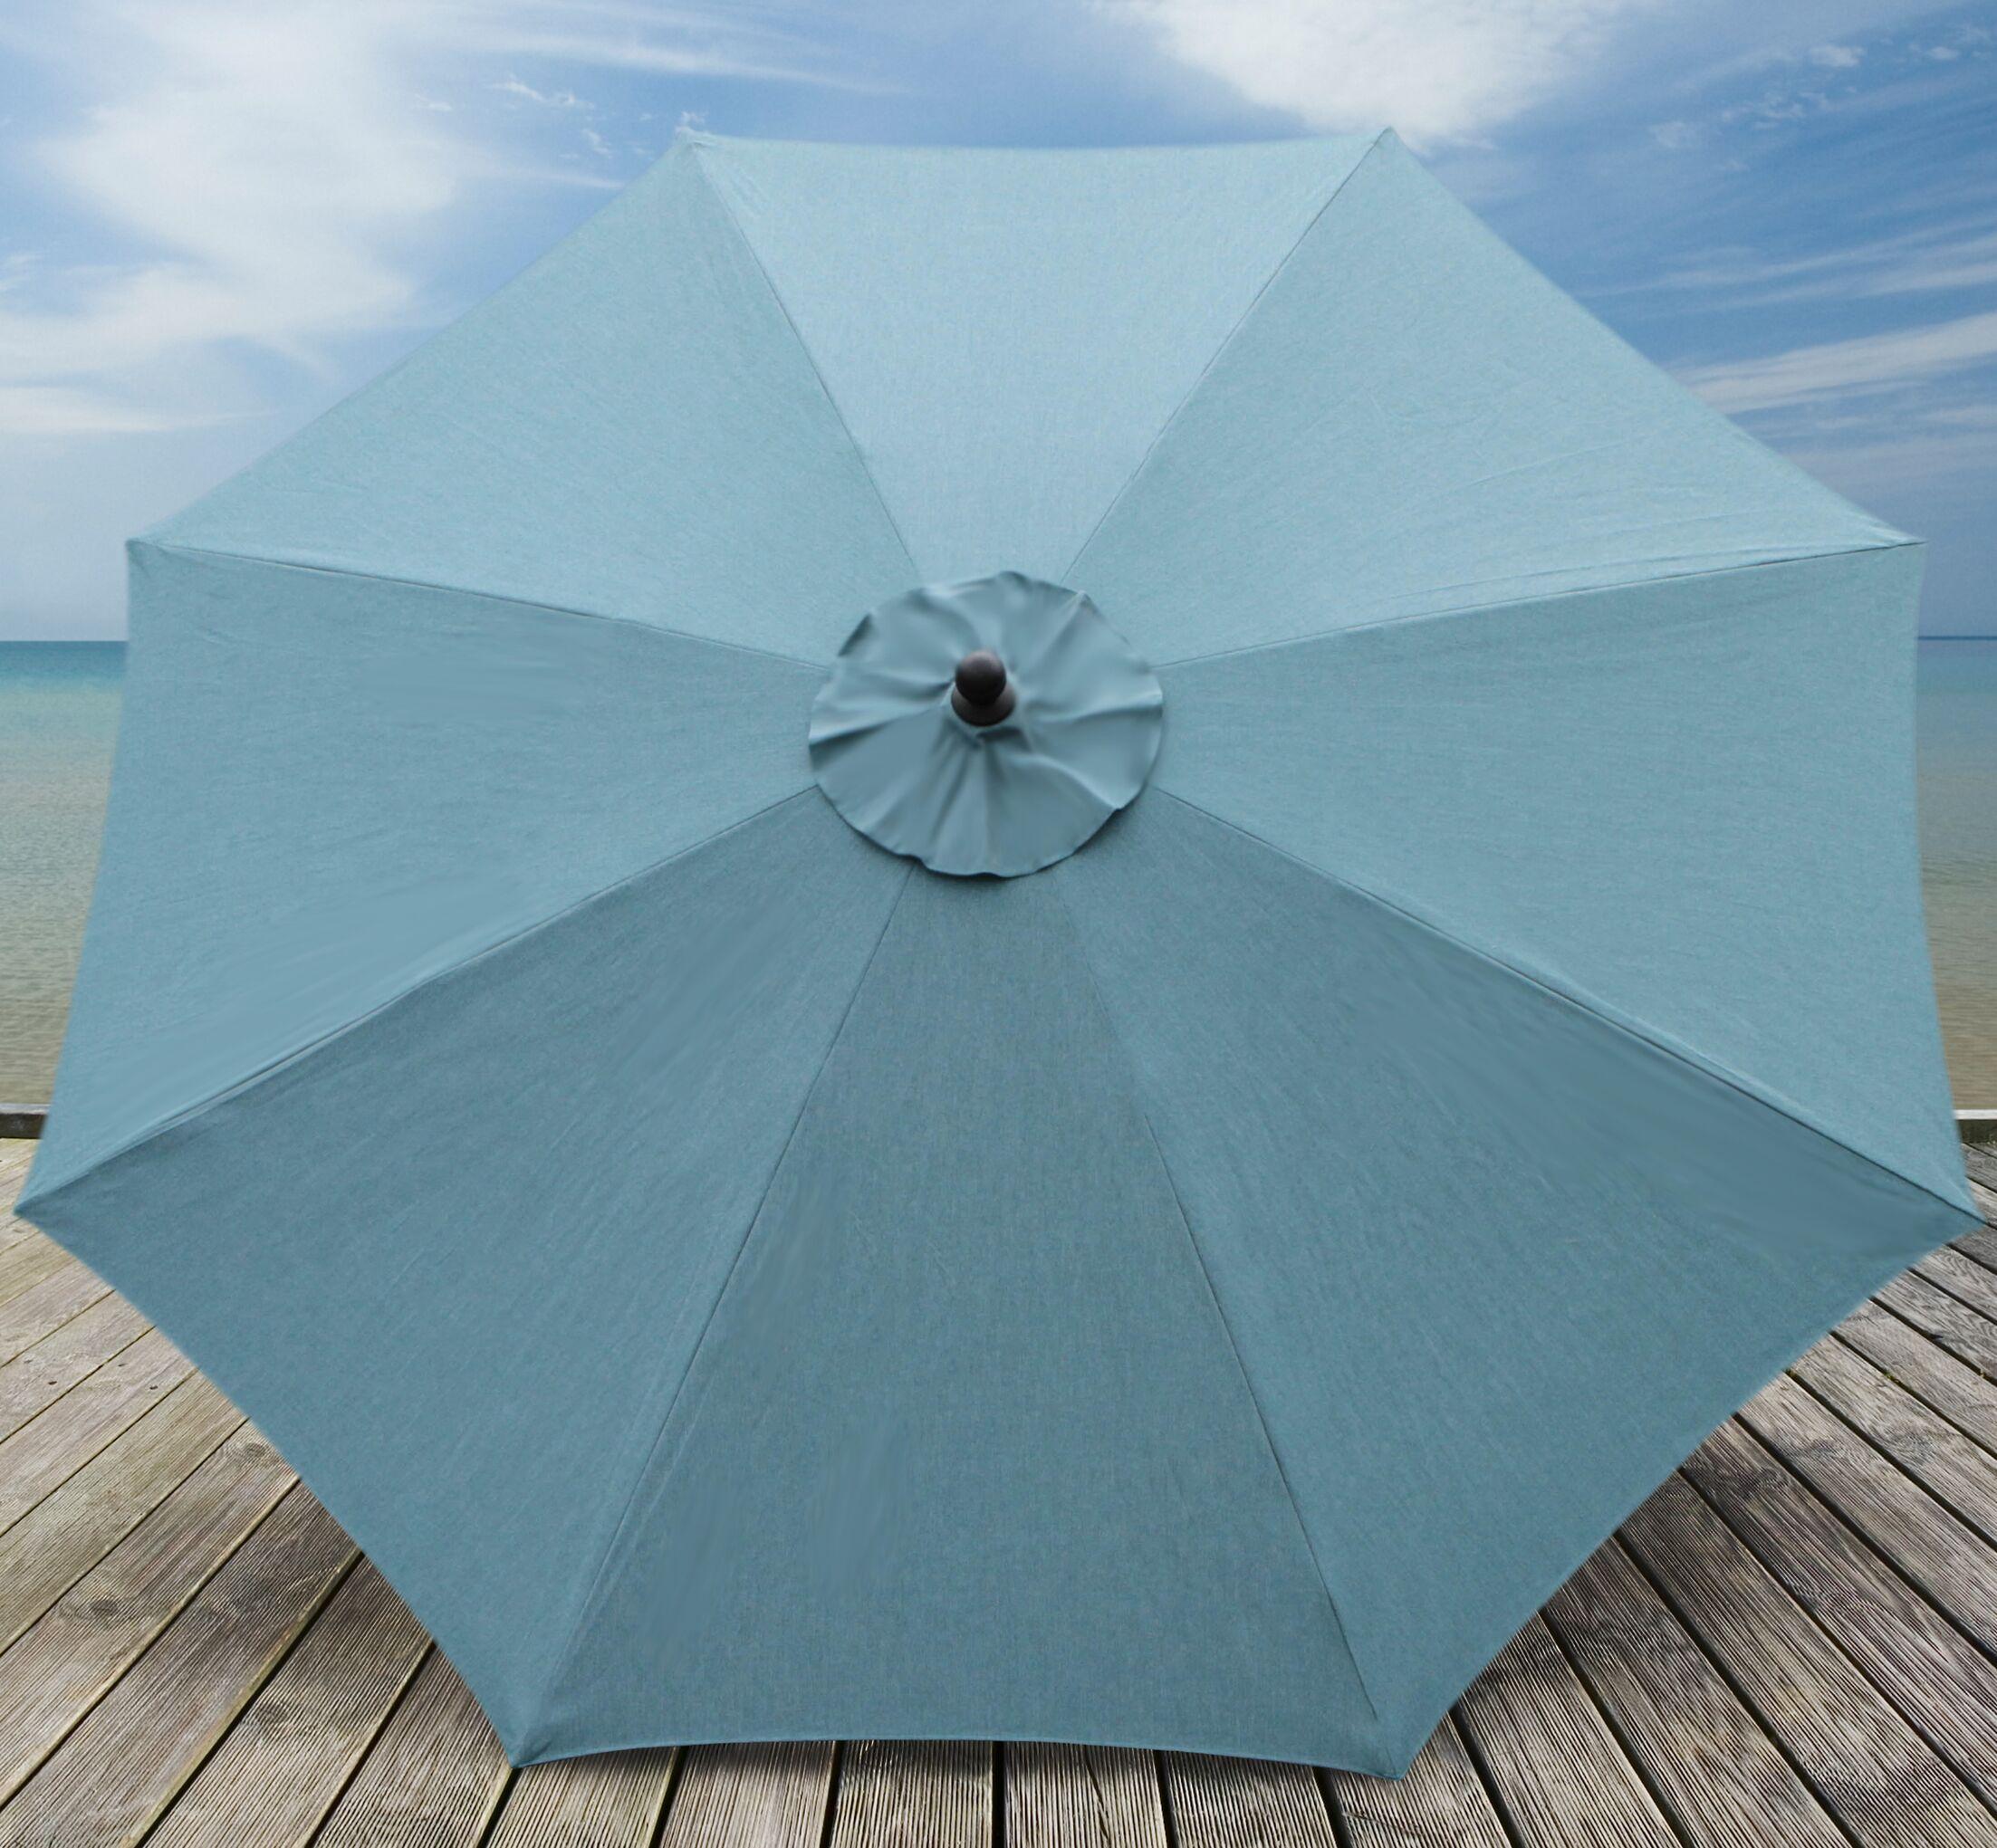 Mucci Madilyn 10' Market Umbrella Fabric Color: Cast Lagoon